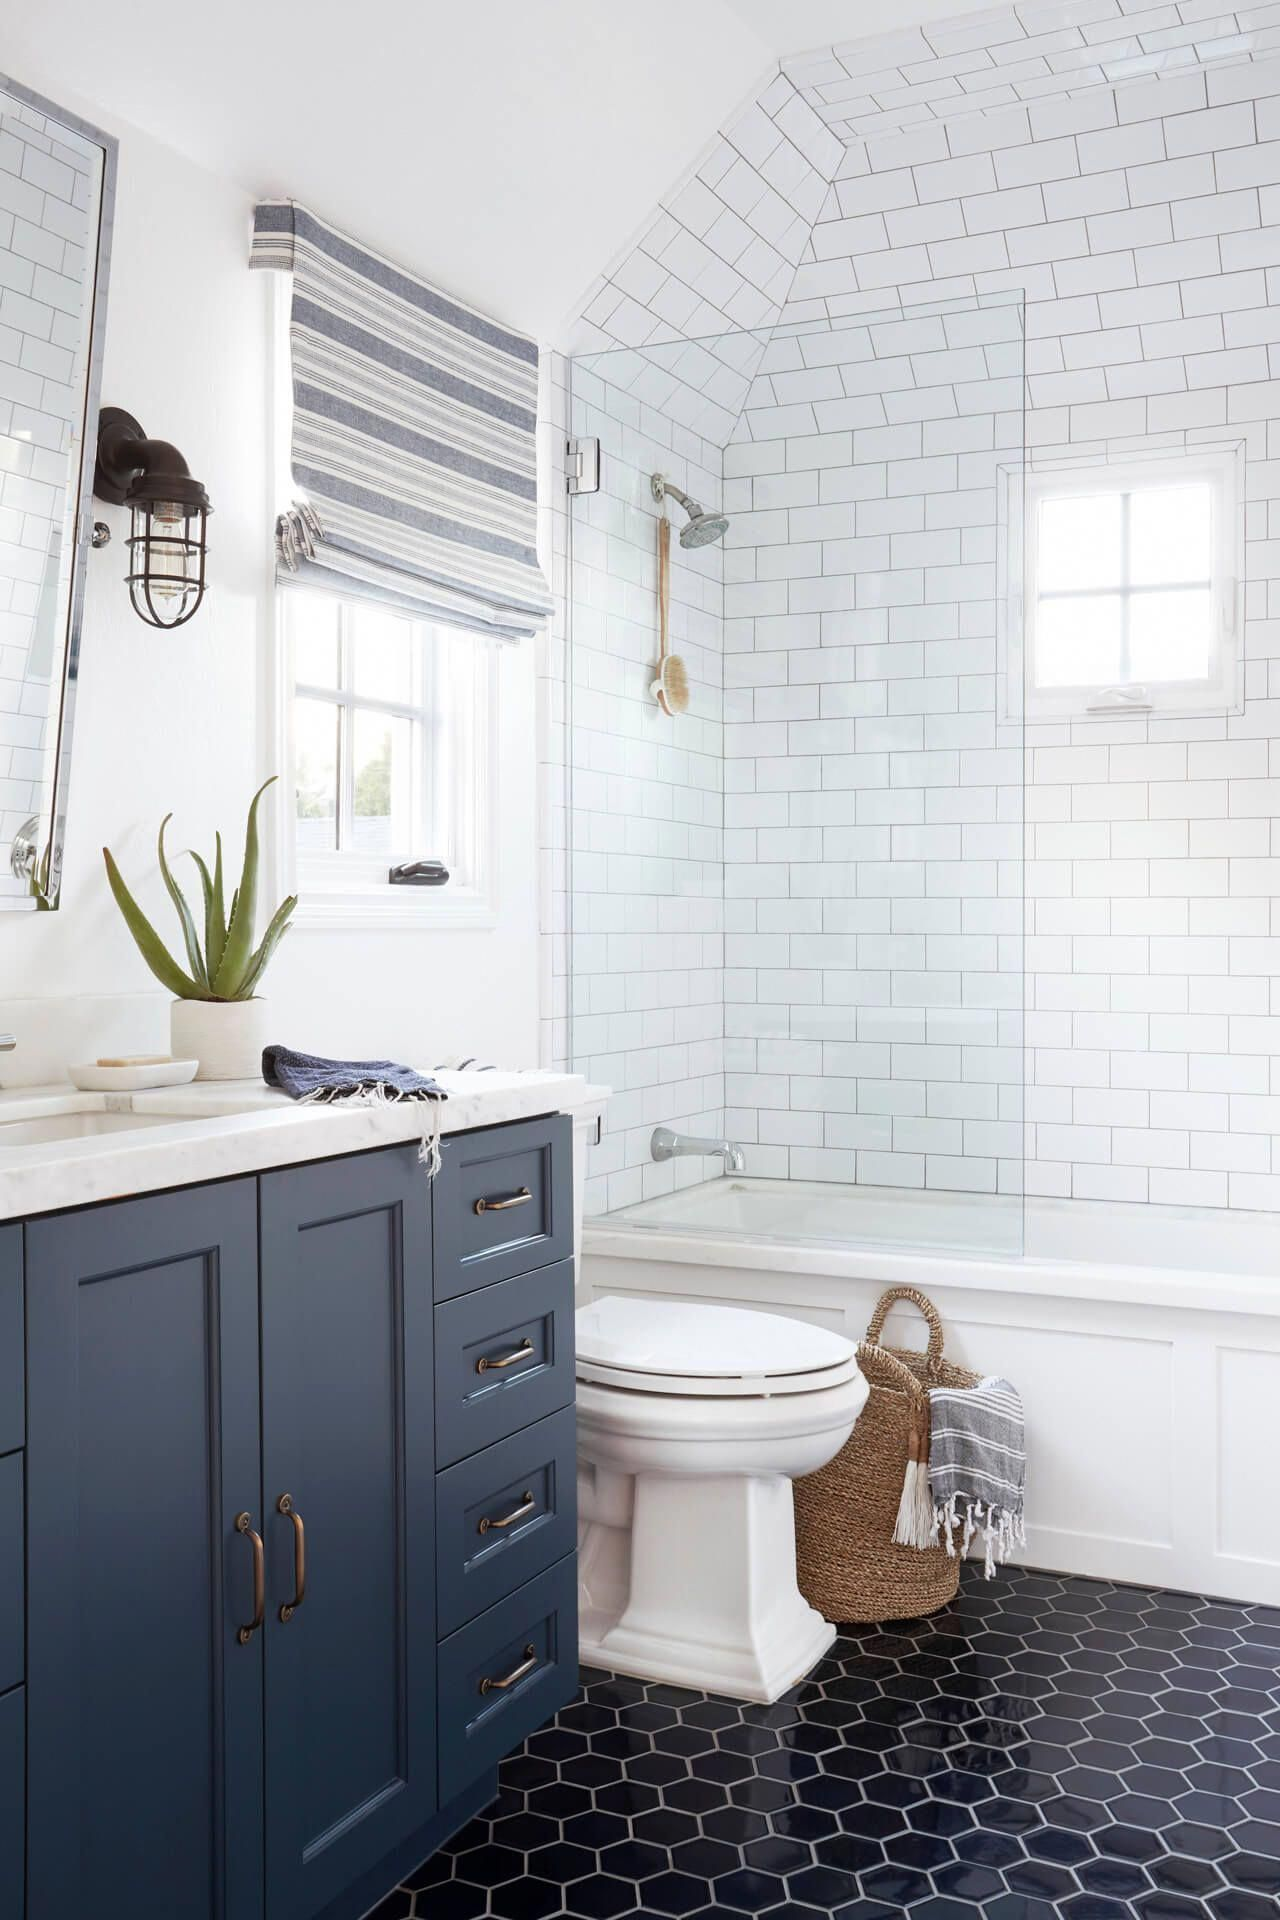 7 Pretty Bathroom Floor Tile Ideas To Pin Even If You Re Not Remodeling Hunker Bathroom Floor Tiles Pretty Bathrooms Bathroom Interior Design